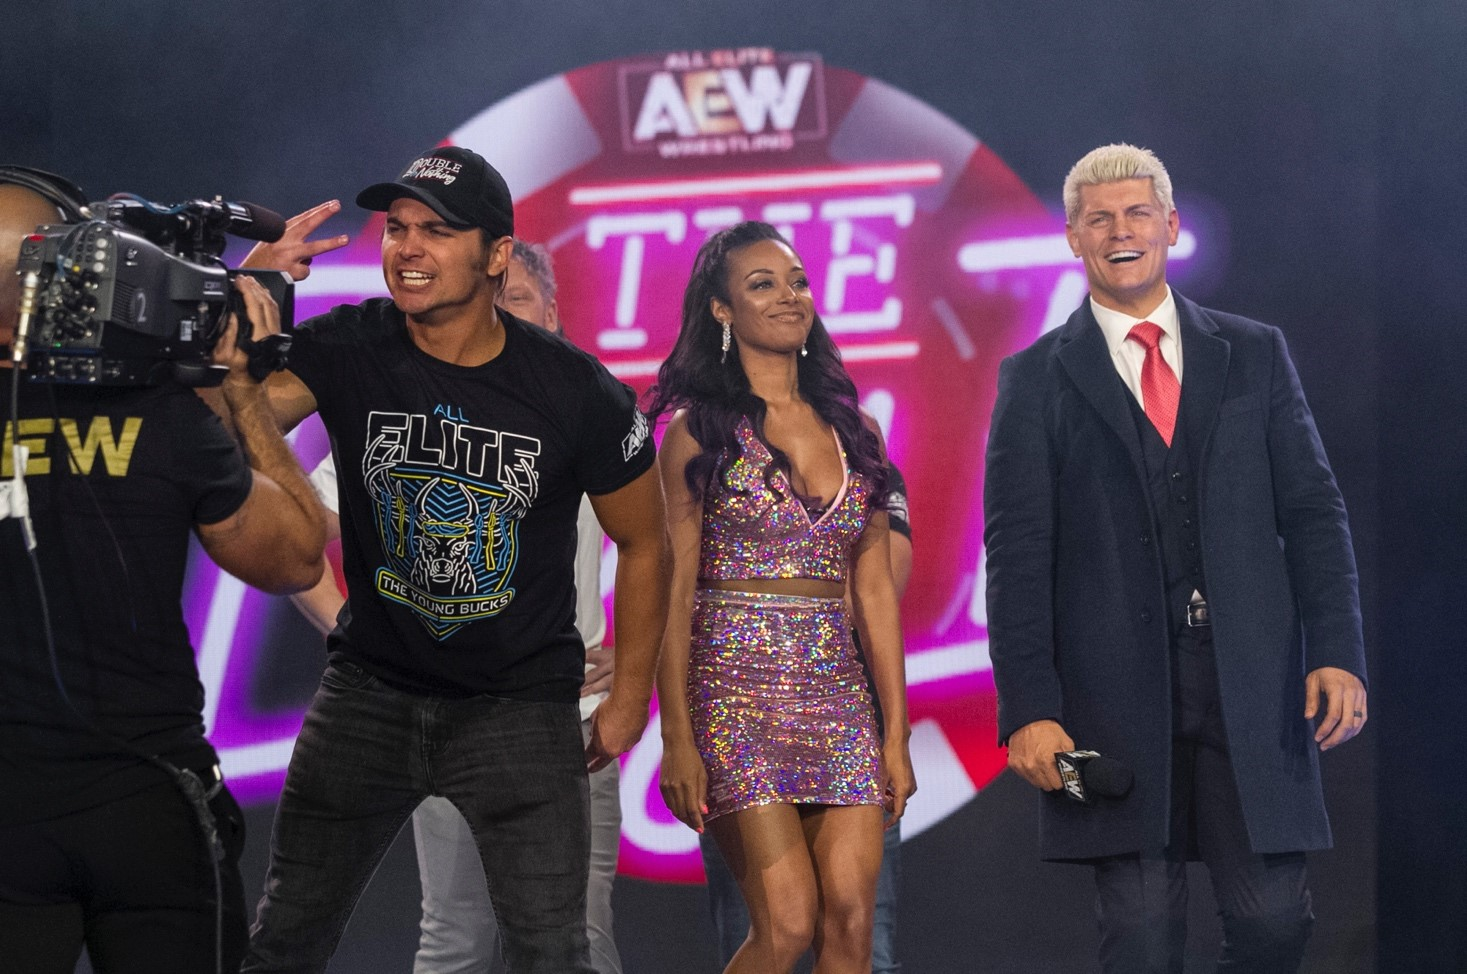 Nick Jackson, Brandi Rhodes (center), and Cody Rhodes at an All Elite Wrestling event.